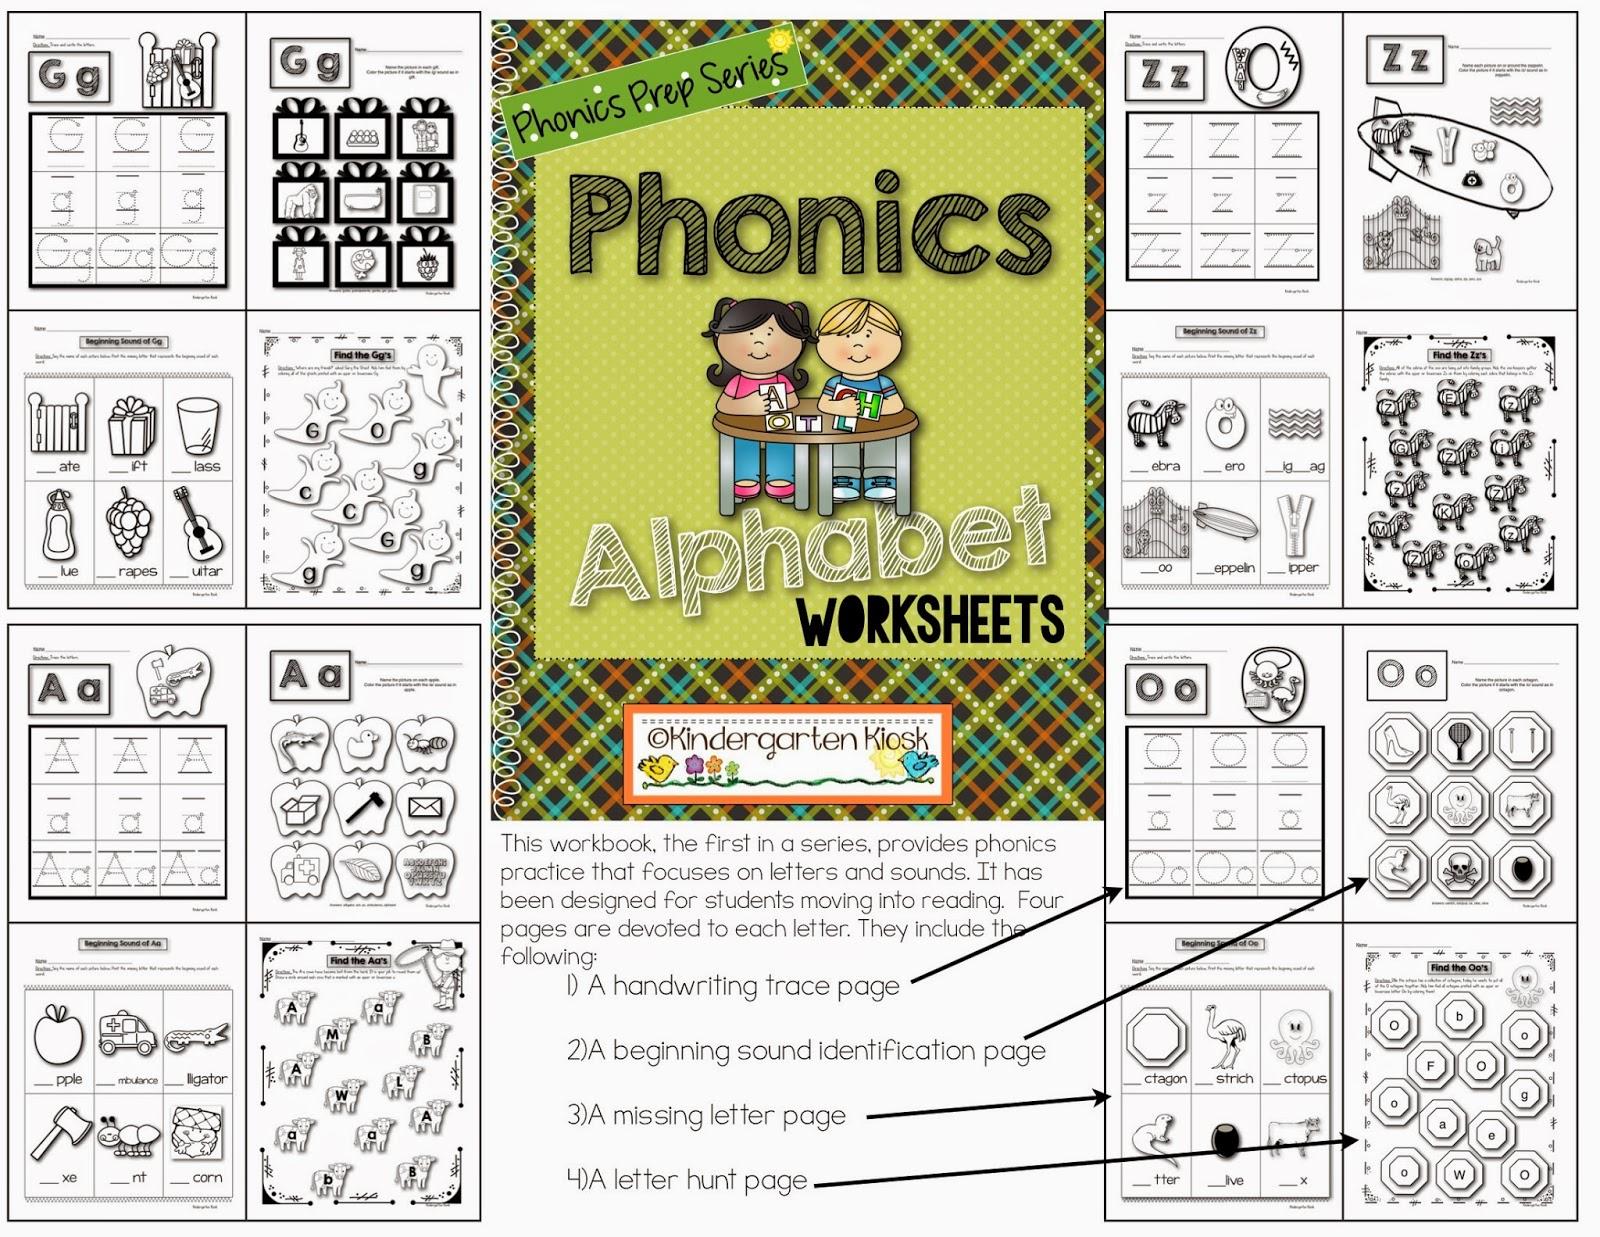 Kindergarten Kiosk Phonics Prep 10 Part Series